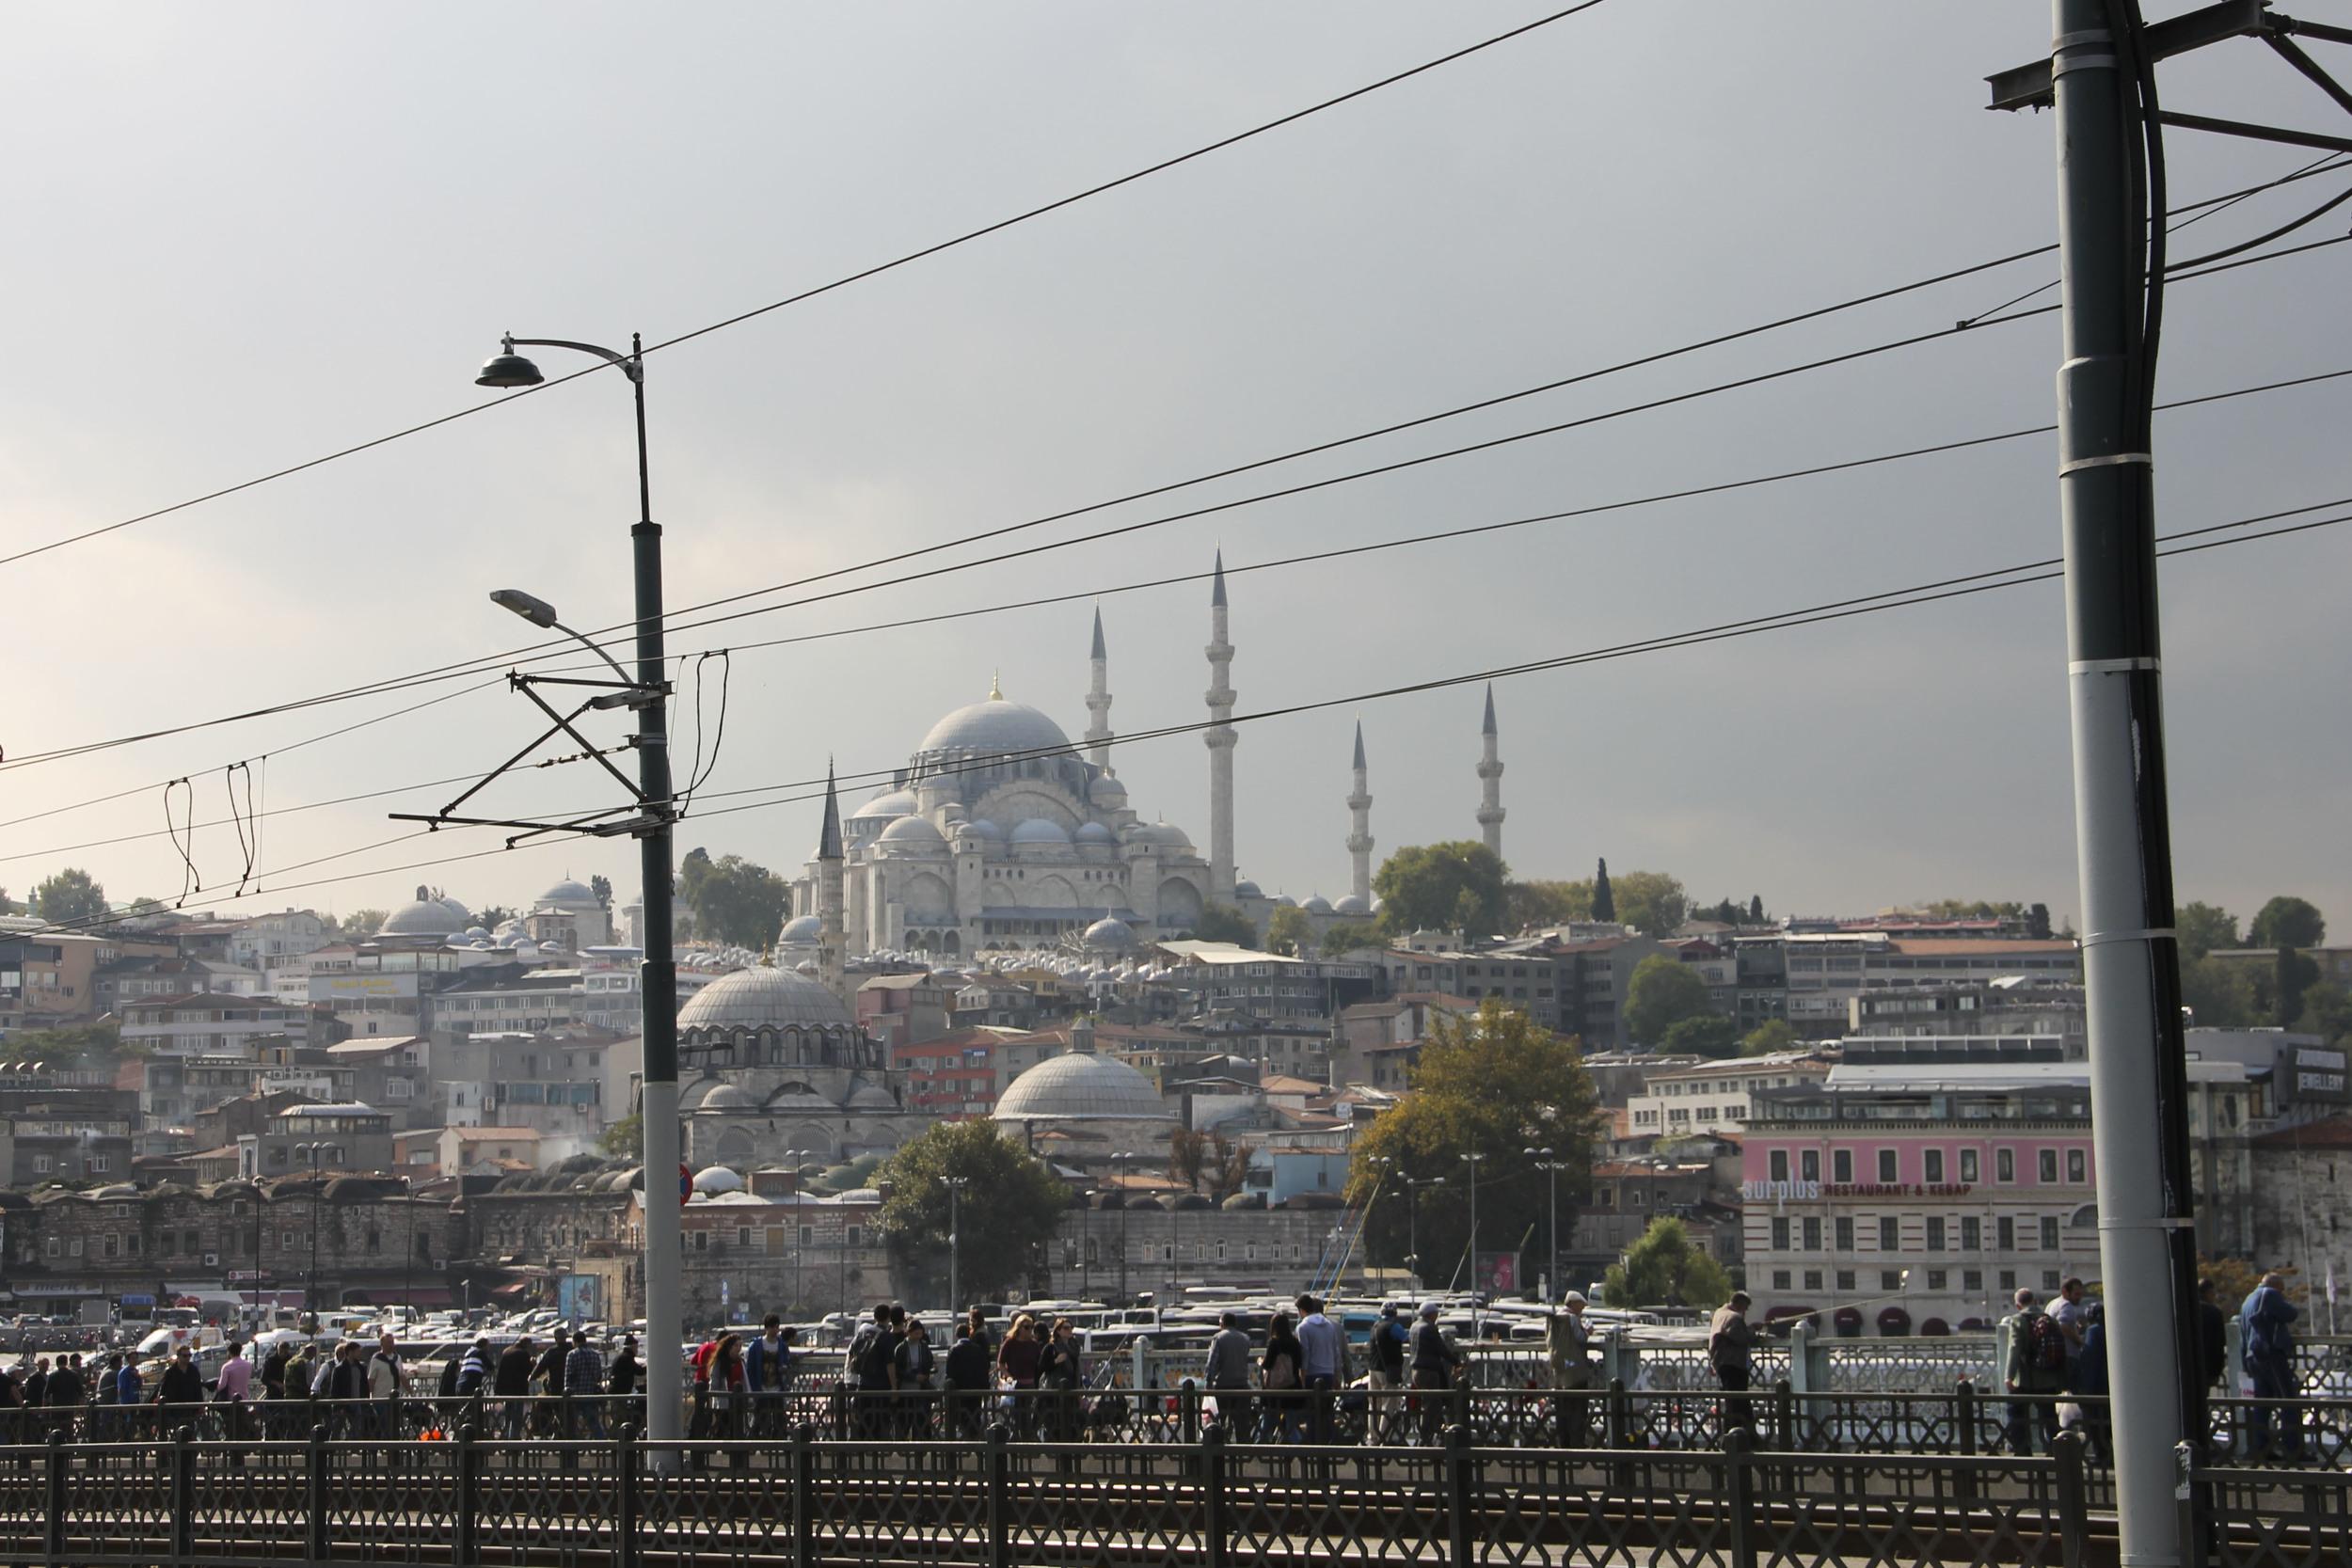 Istanbul, ygatonic on tour, Turkey yoga in istanbul2214.jpg